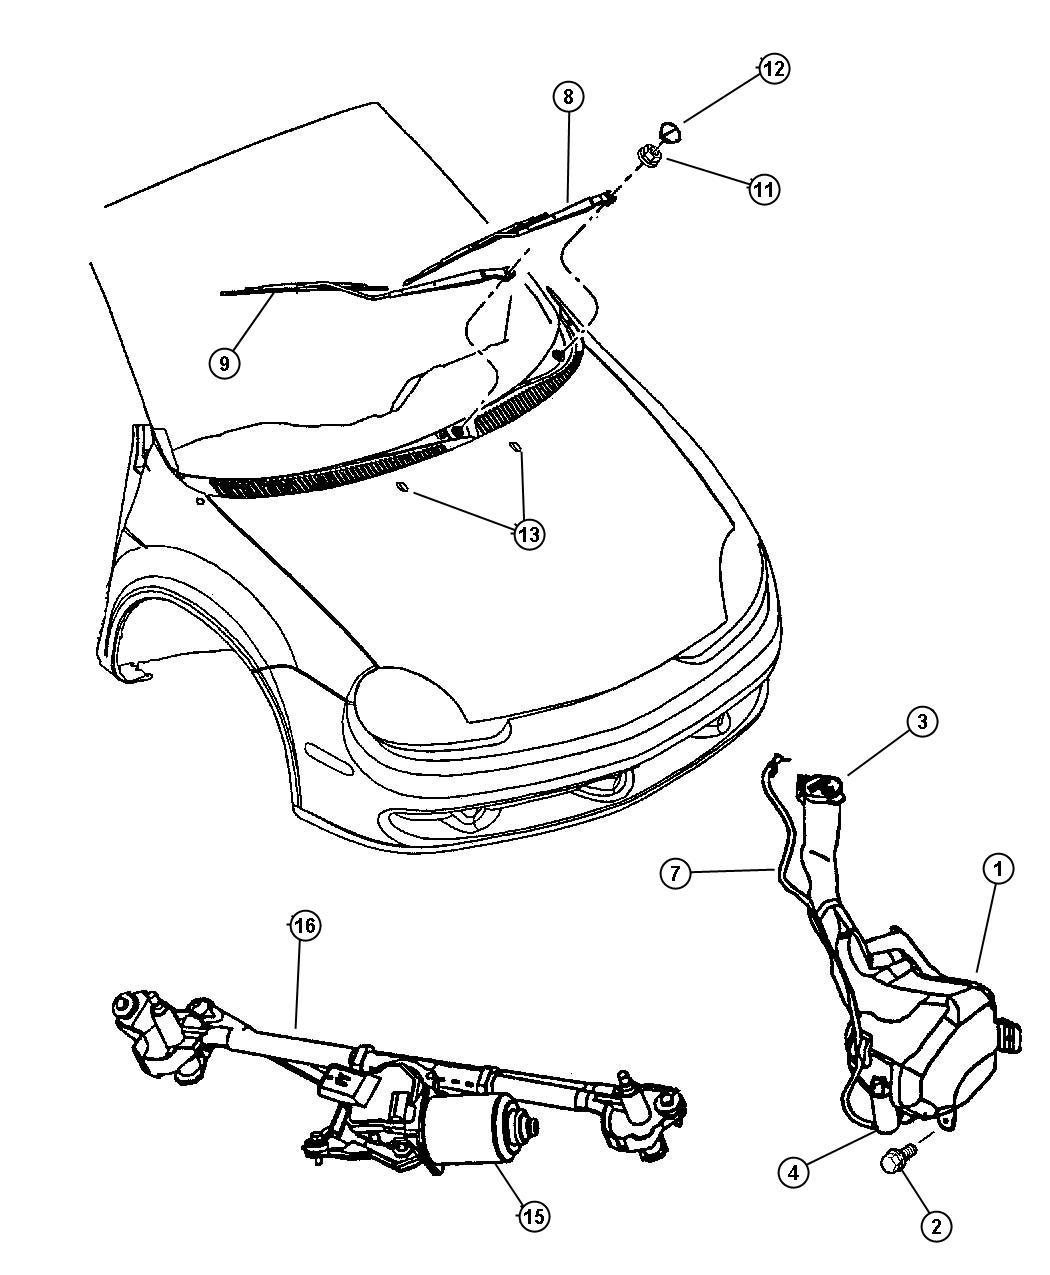 Chrysler Pt Cruiser Connector. Washer hose. Elbow type